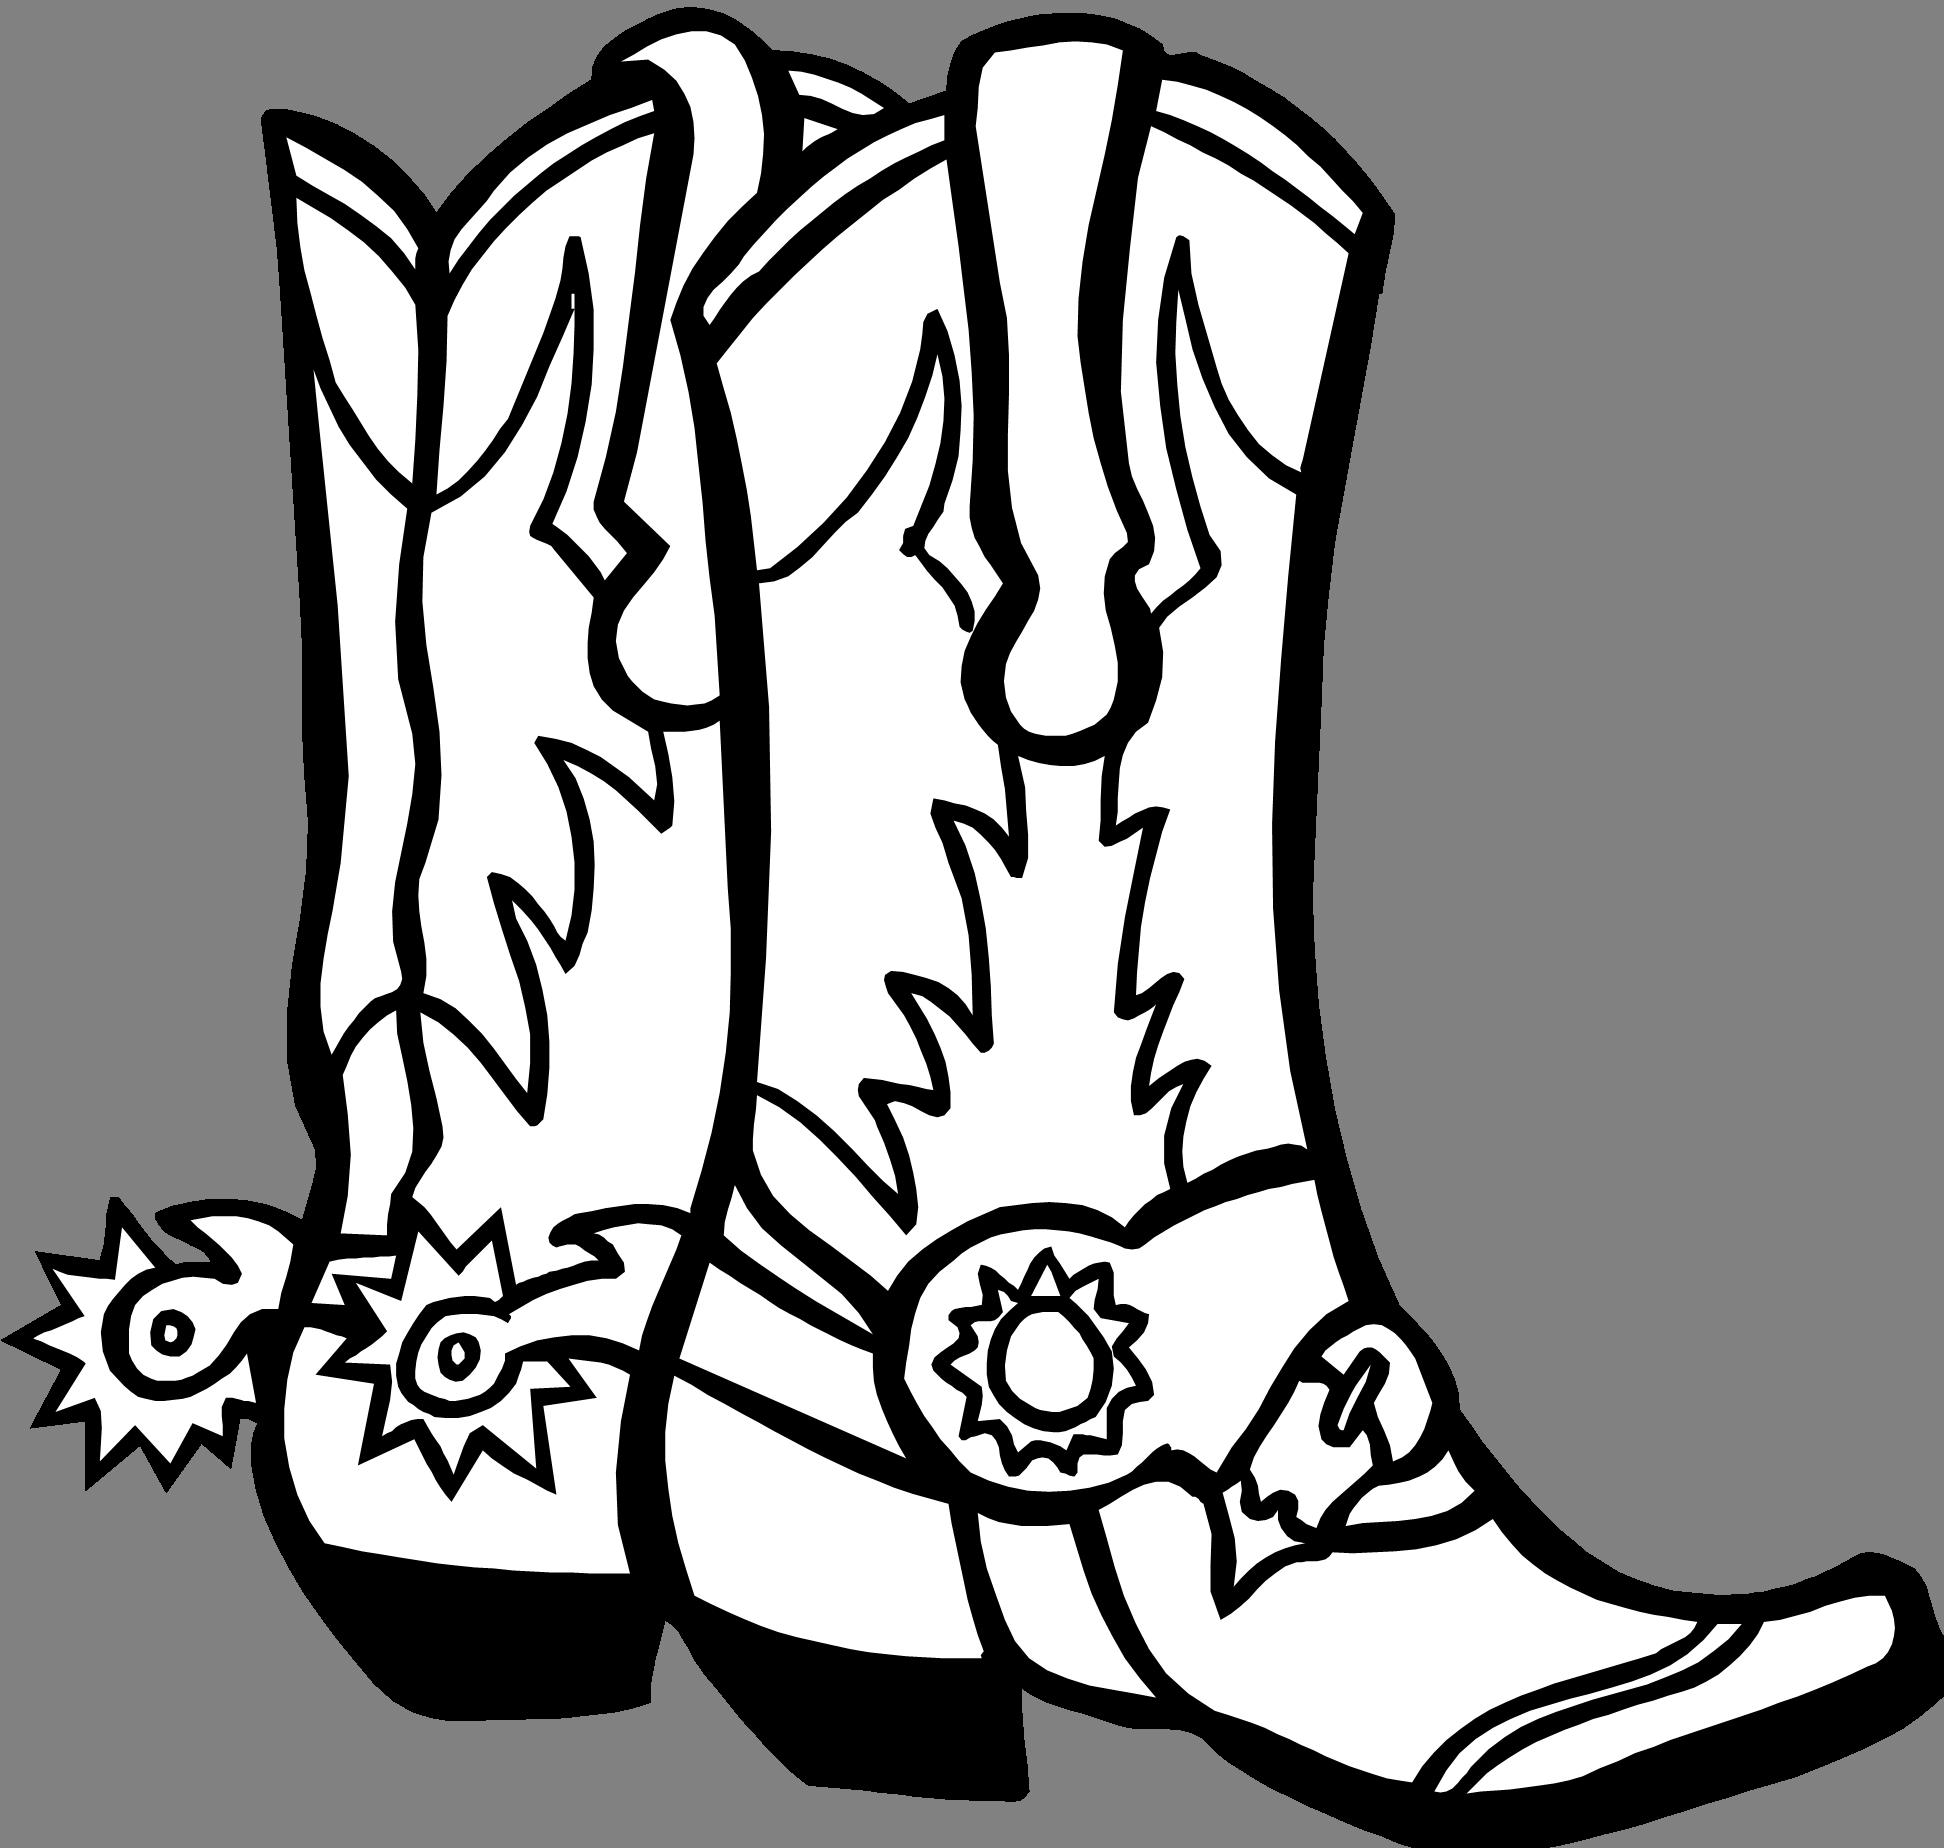 1944x1848 Line Art Graphic Image Cowboy Boots Reboot